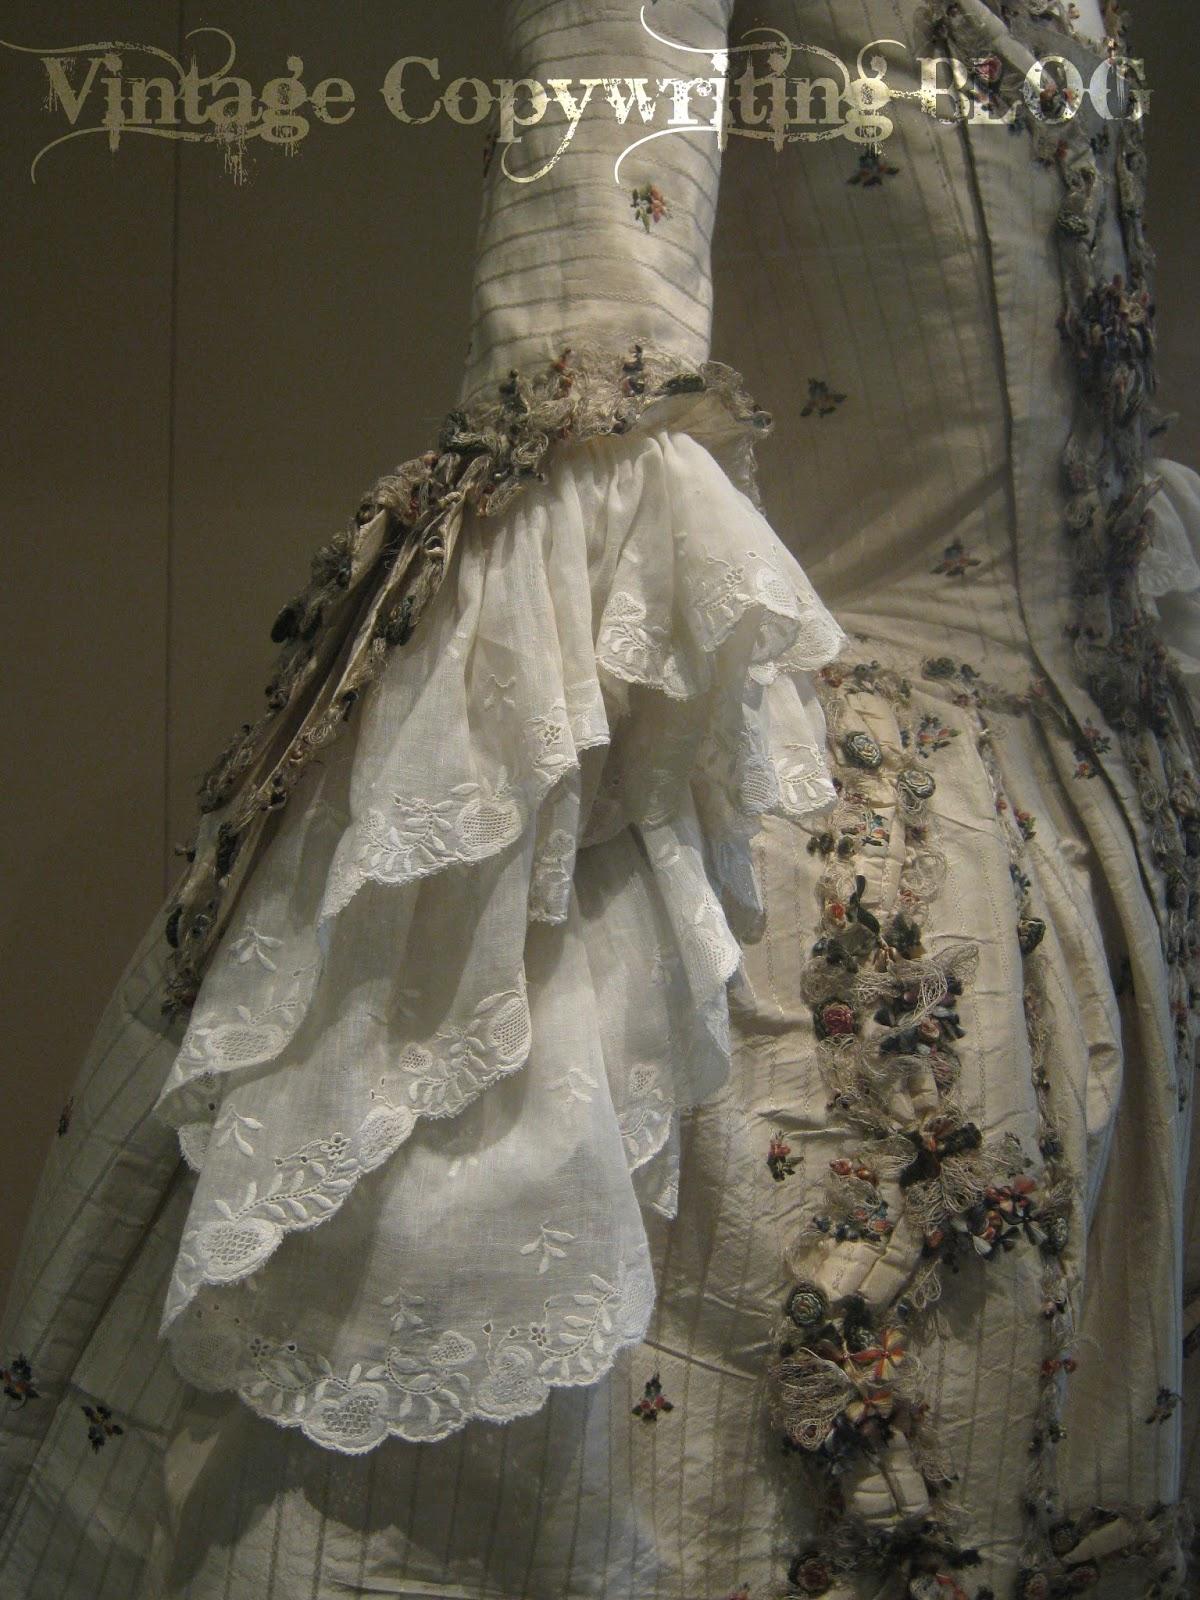 Vintage Gallery 4 Kenneth Sanderson S 18th Century Dress